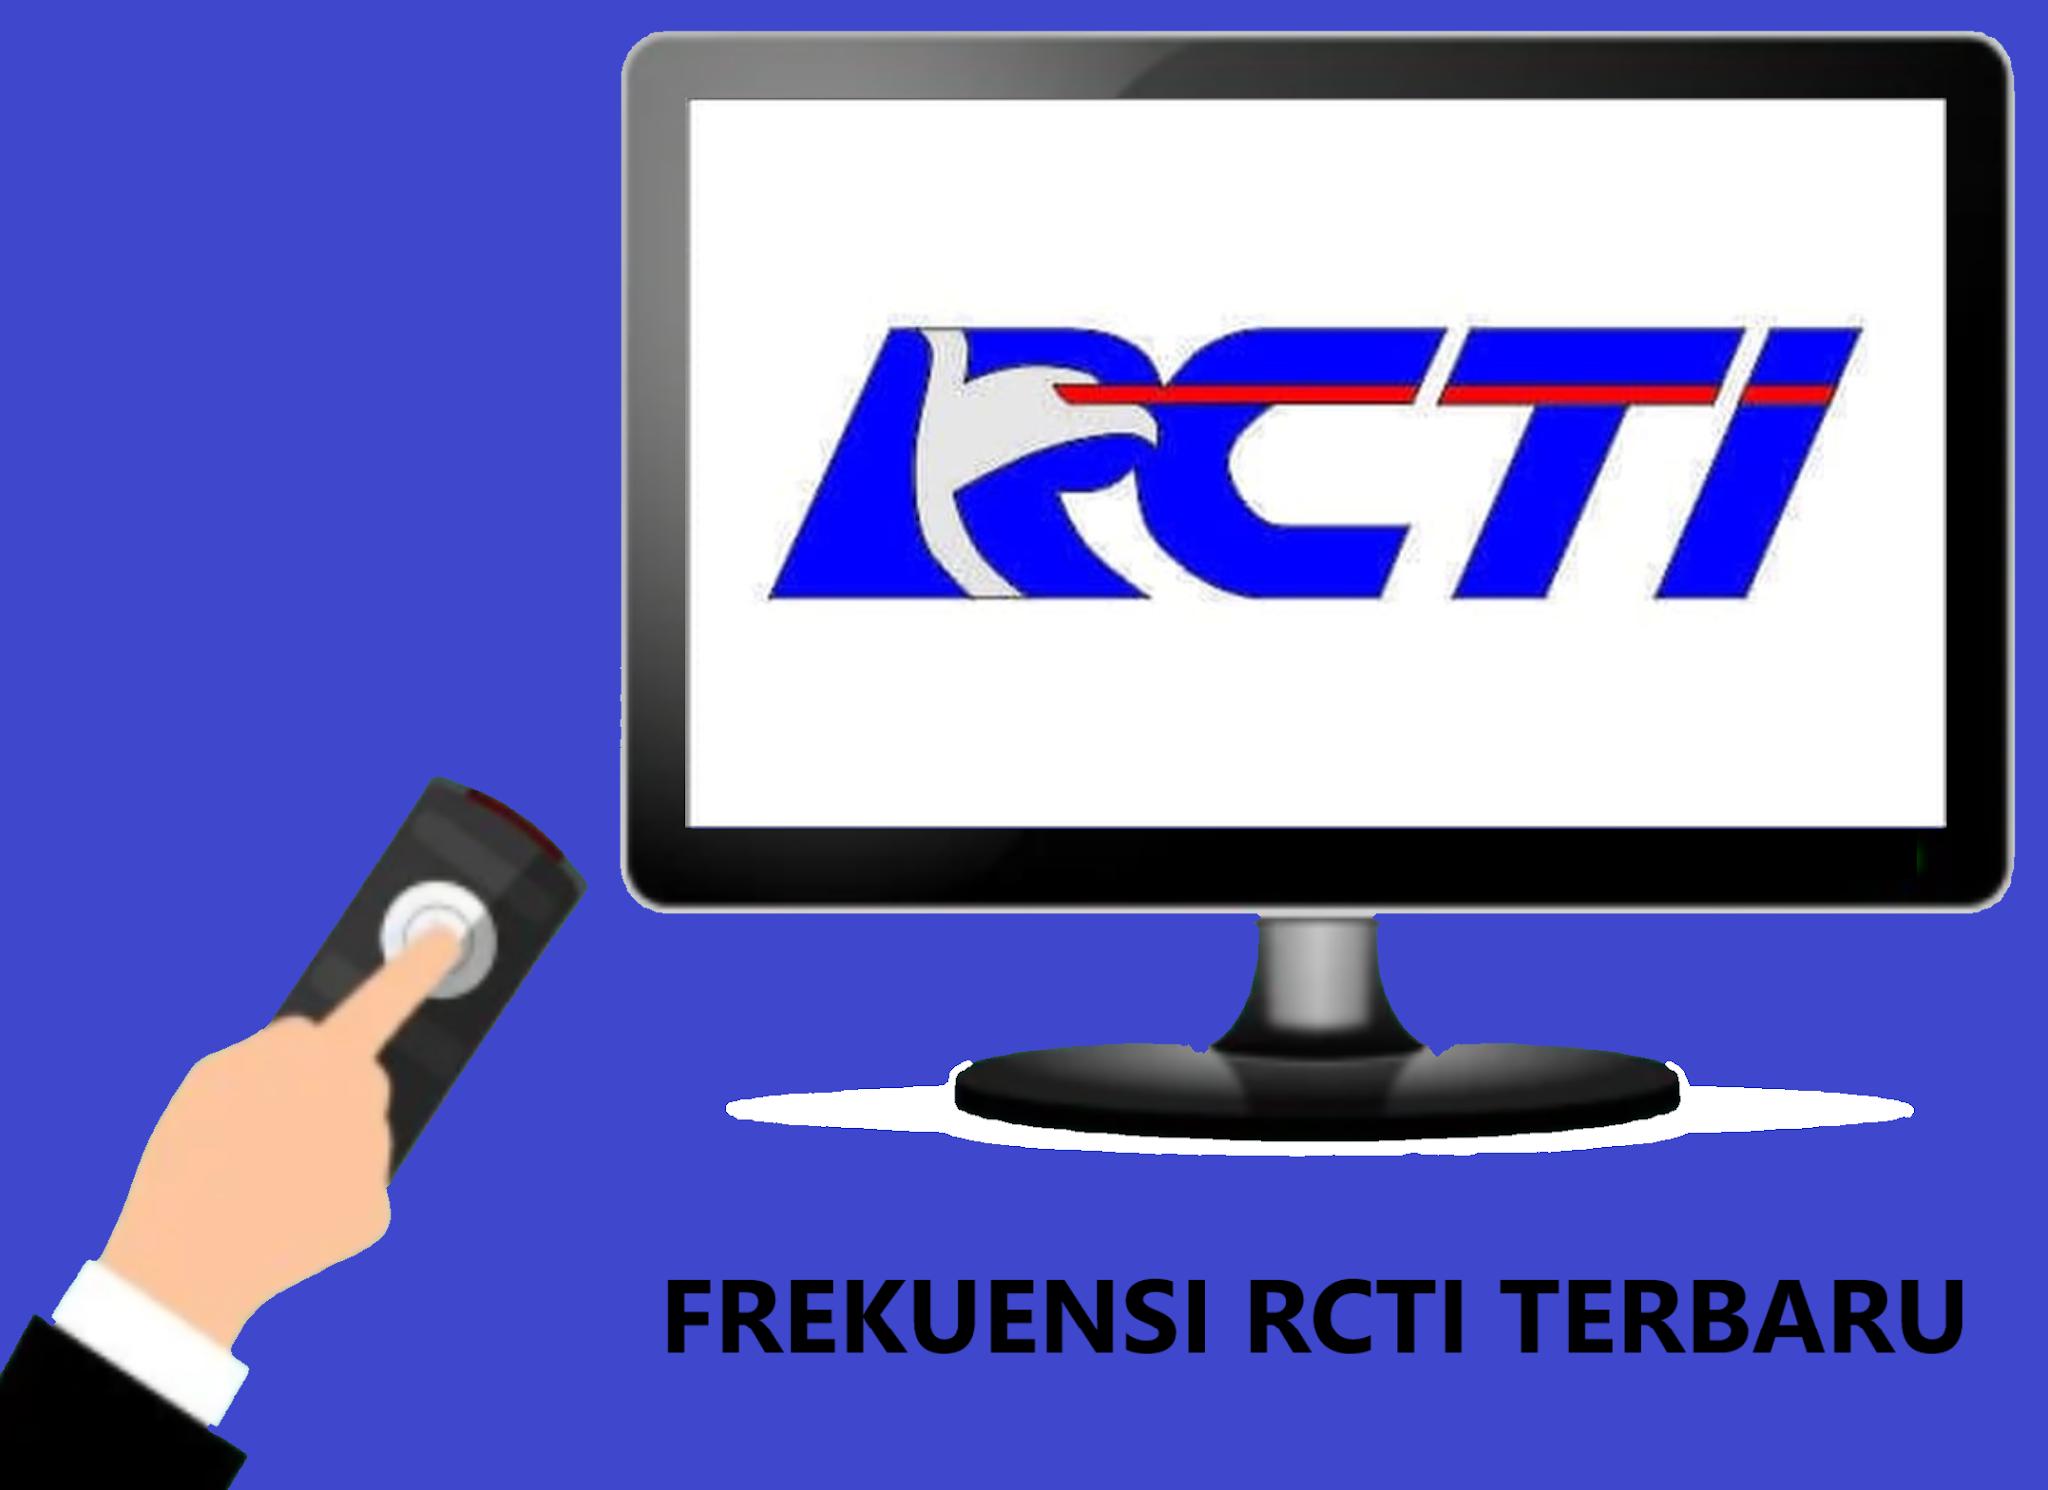 Frekuensi RCTI Terbaru Di Telkom 4 Update 2020